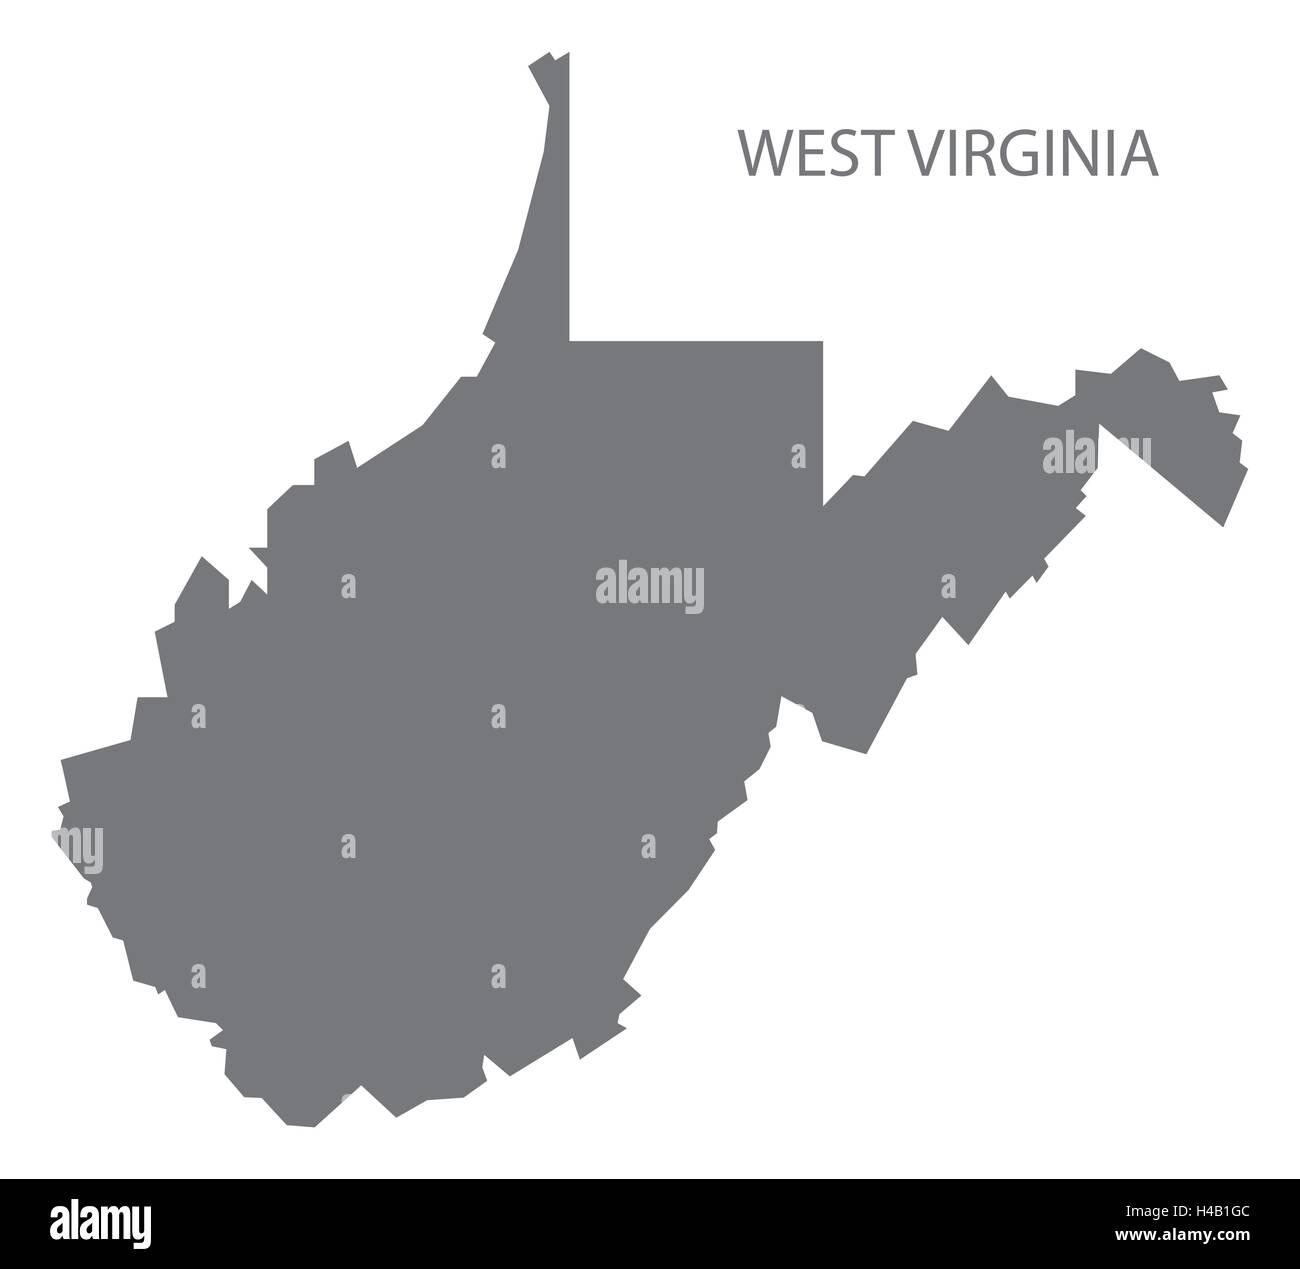 West Virginia USA Map in grey Stock Vector Art & Illustration ...